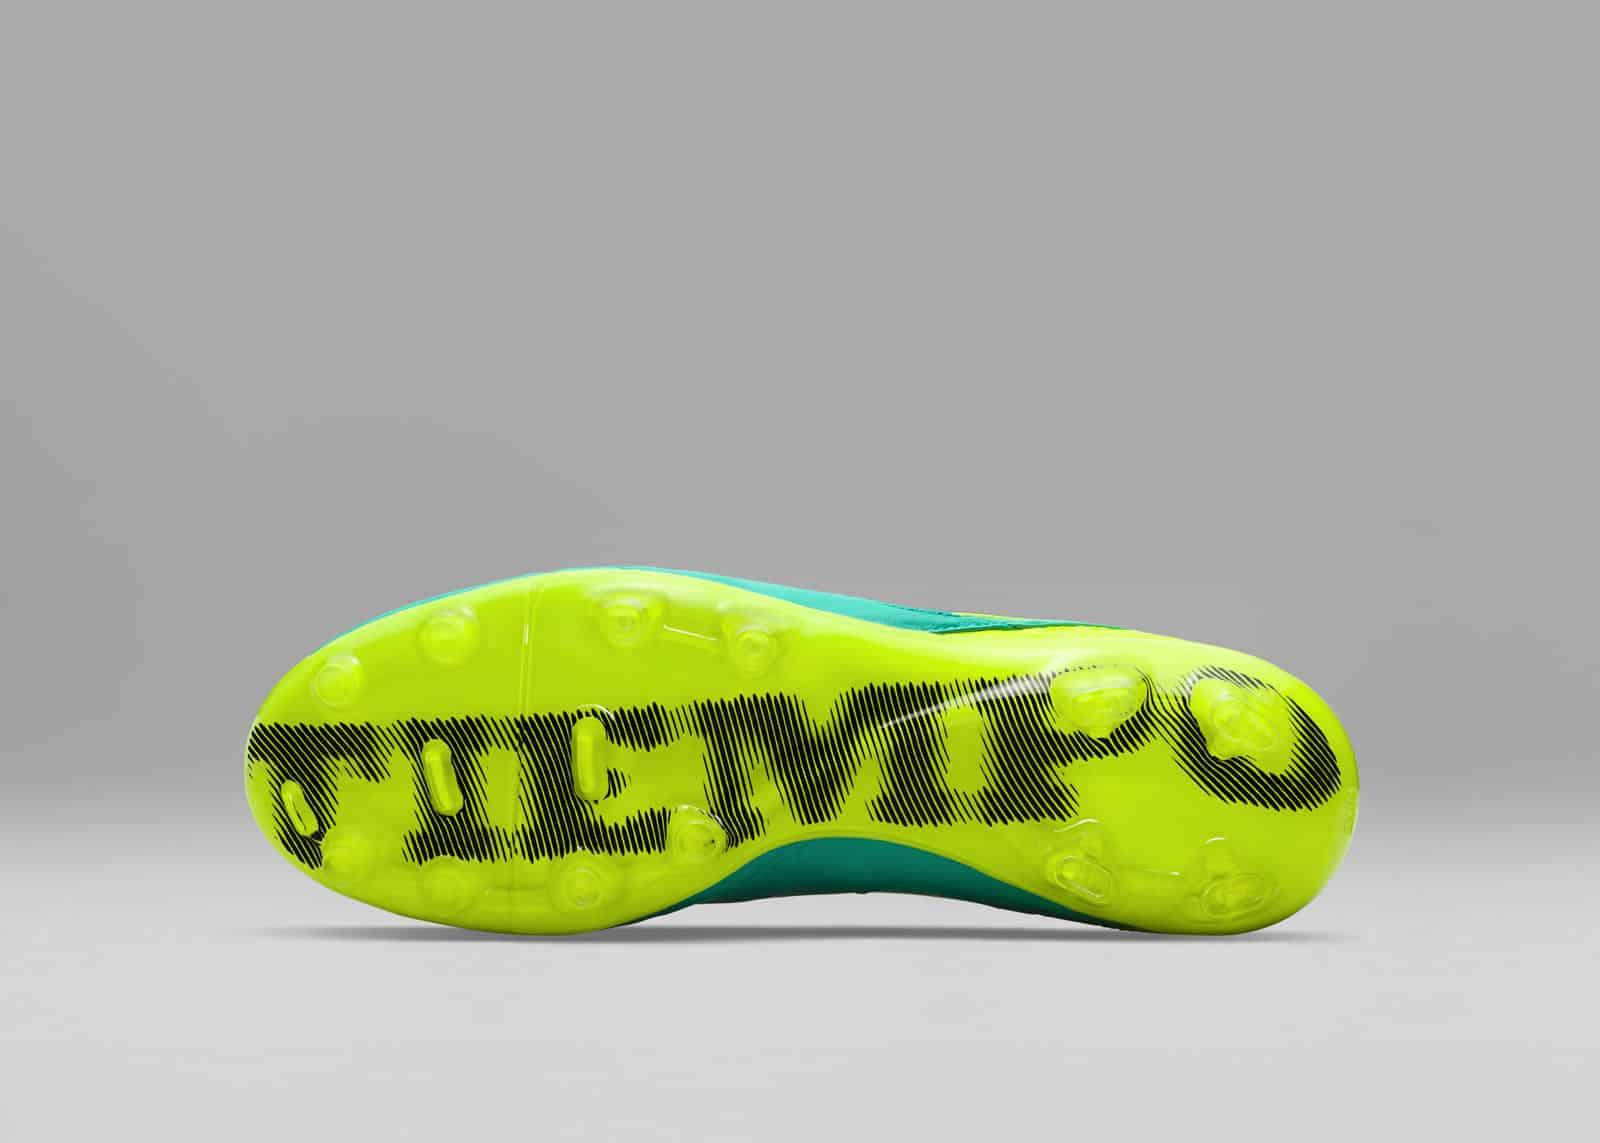 chaussure-football-nike-tiempo-euro-2016